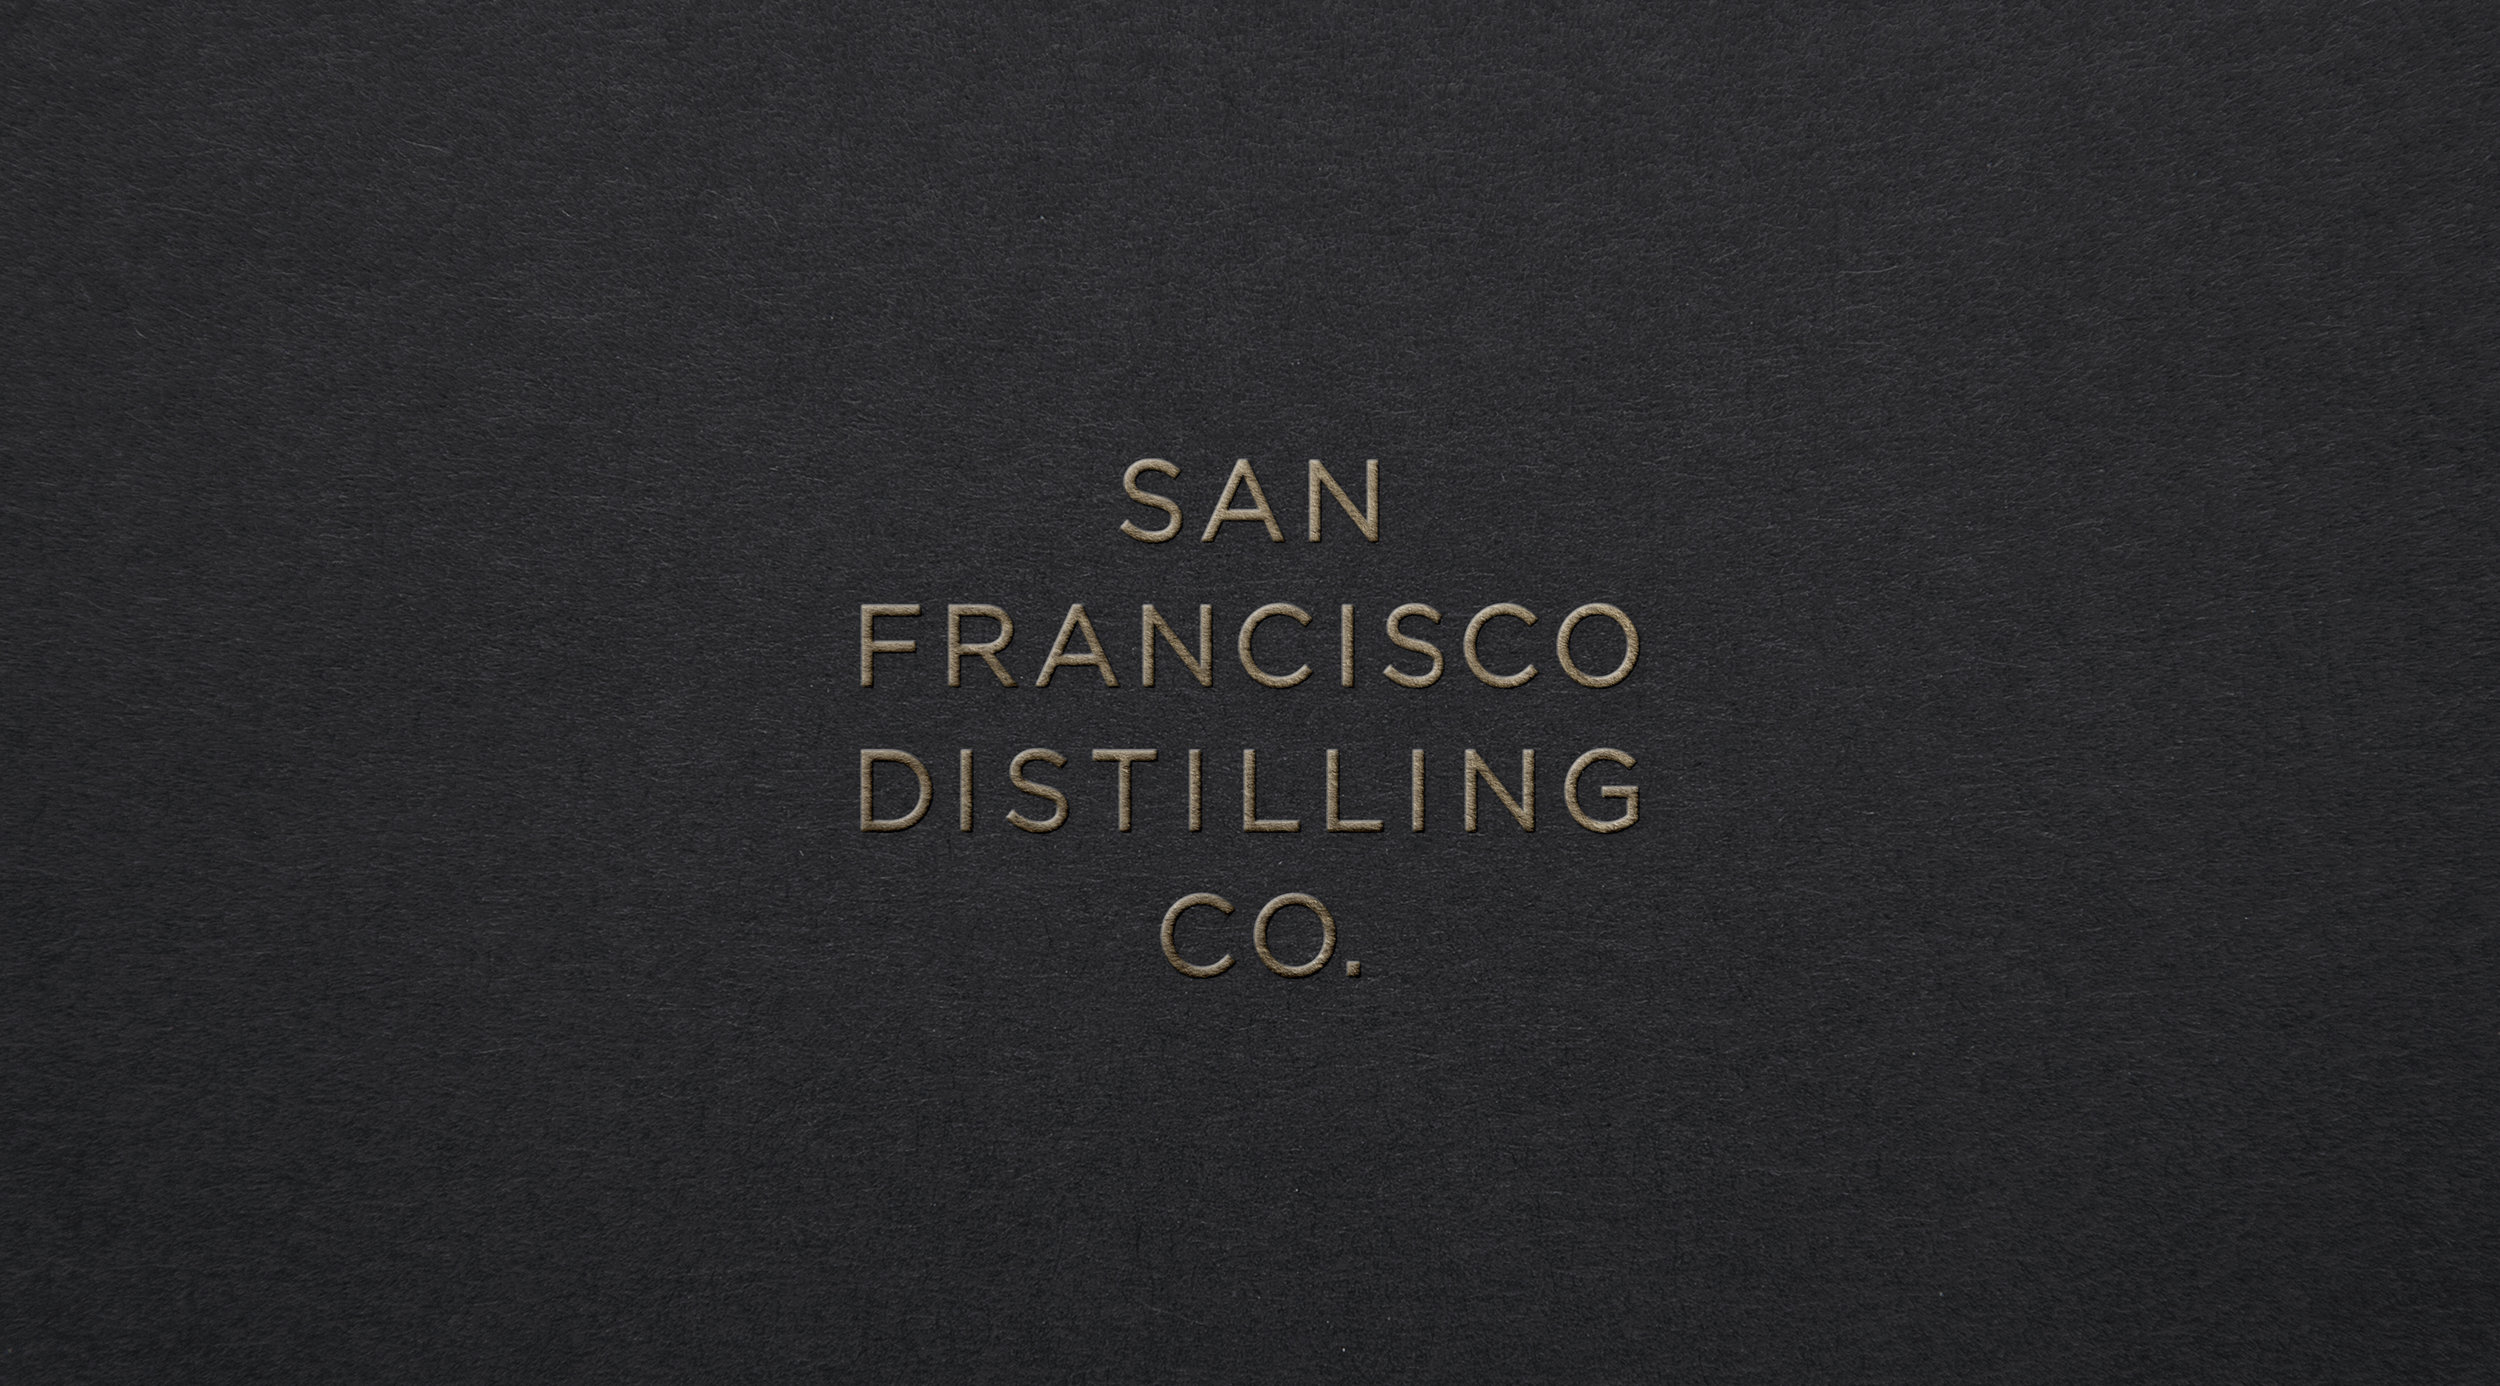 San Francisco Distilling Co.